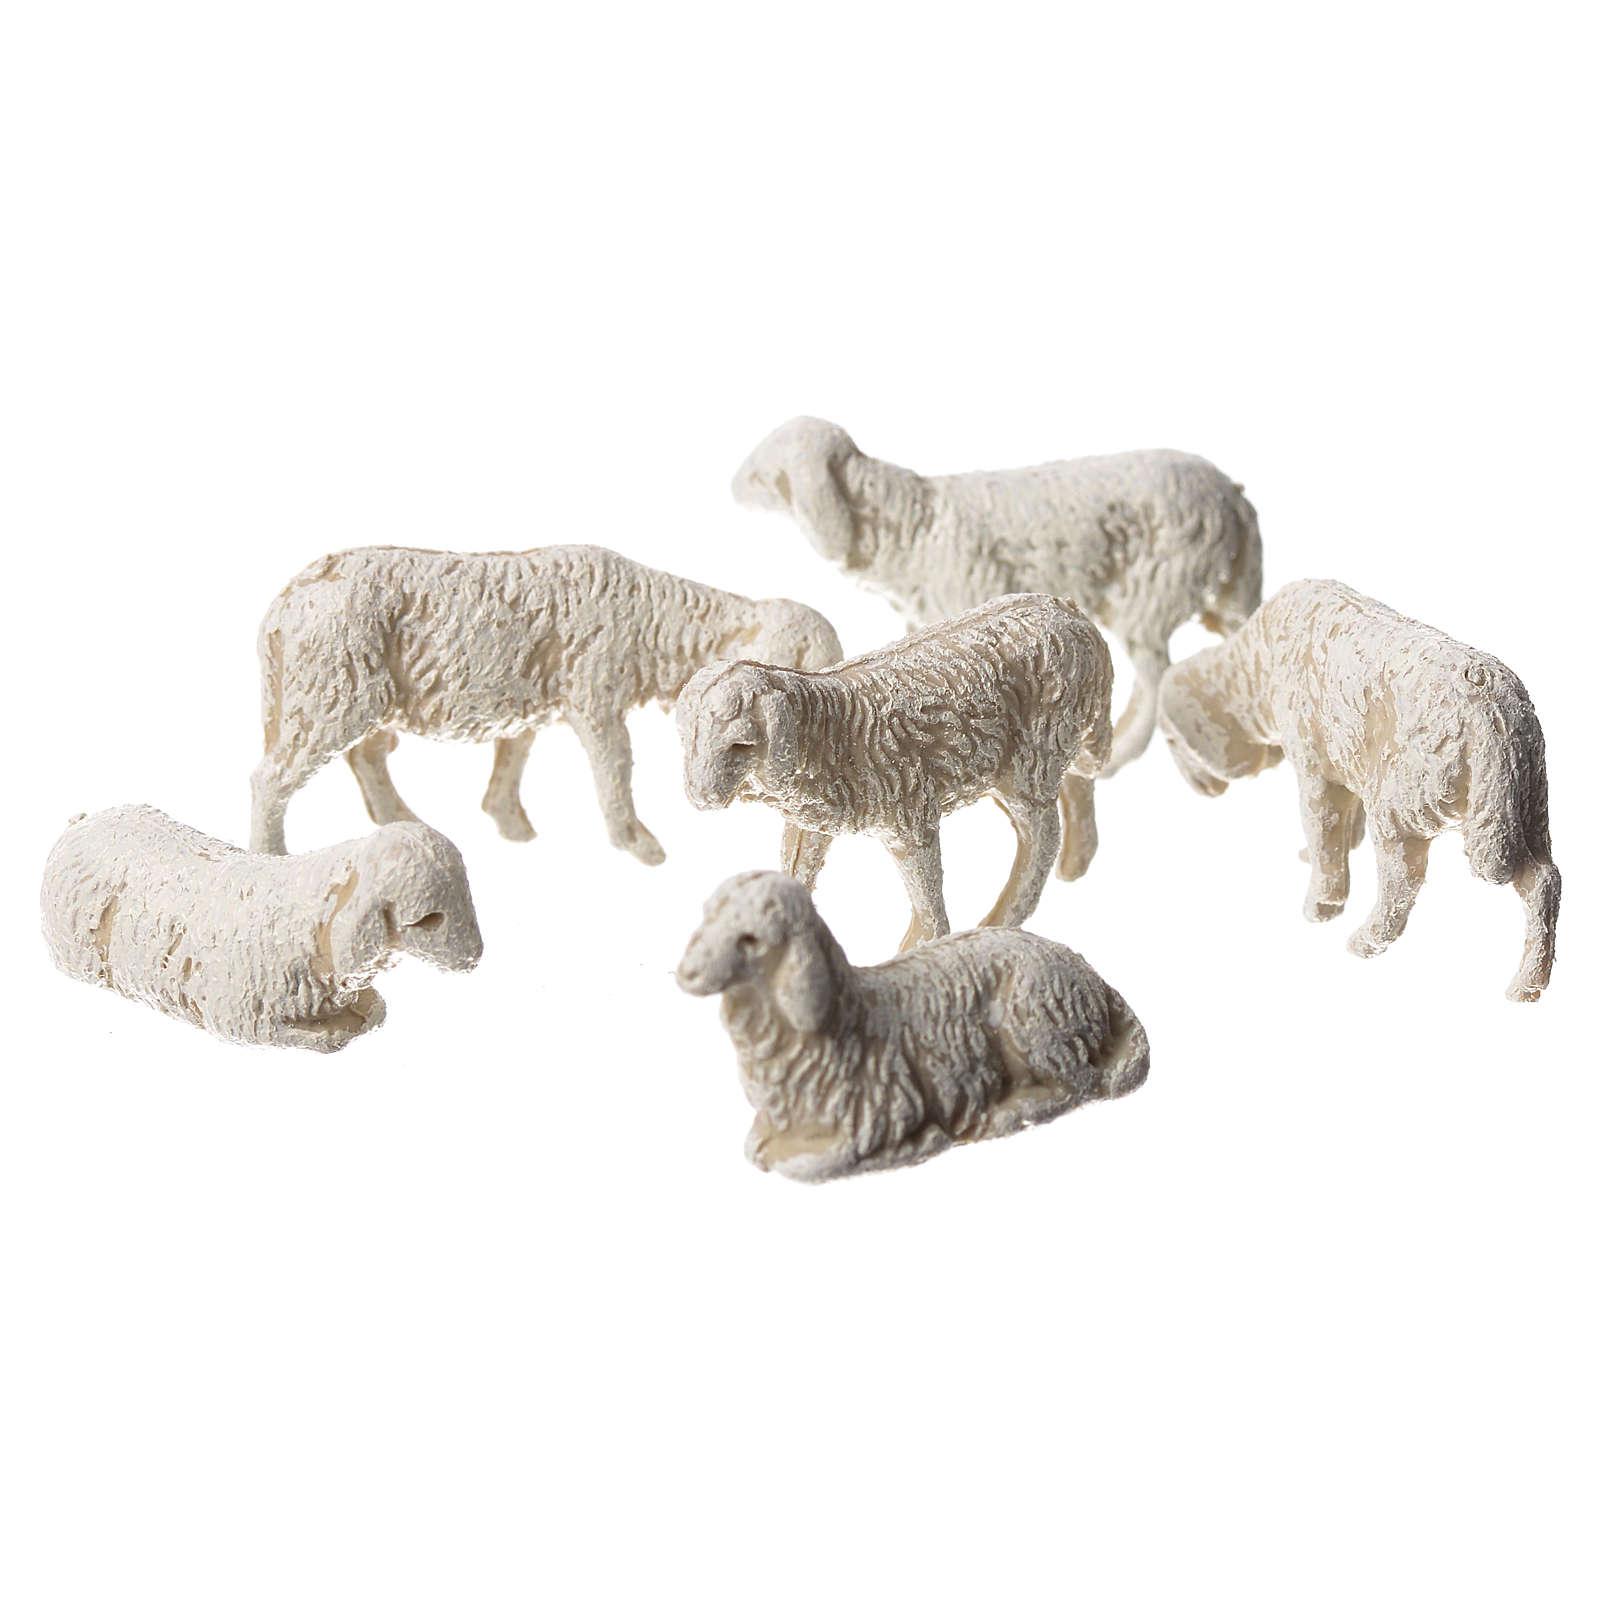 Owce 6 szt. szopka Moranduzzo 3.5 cm 4